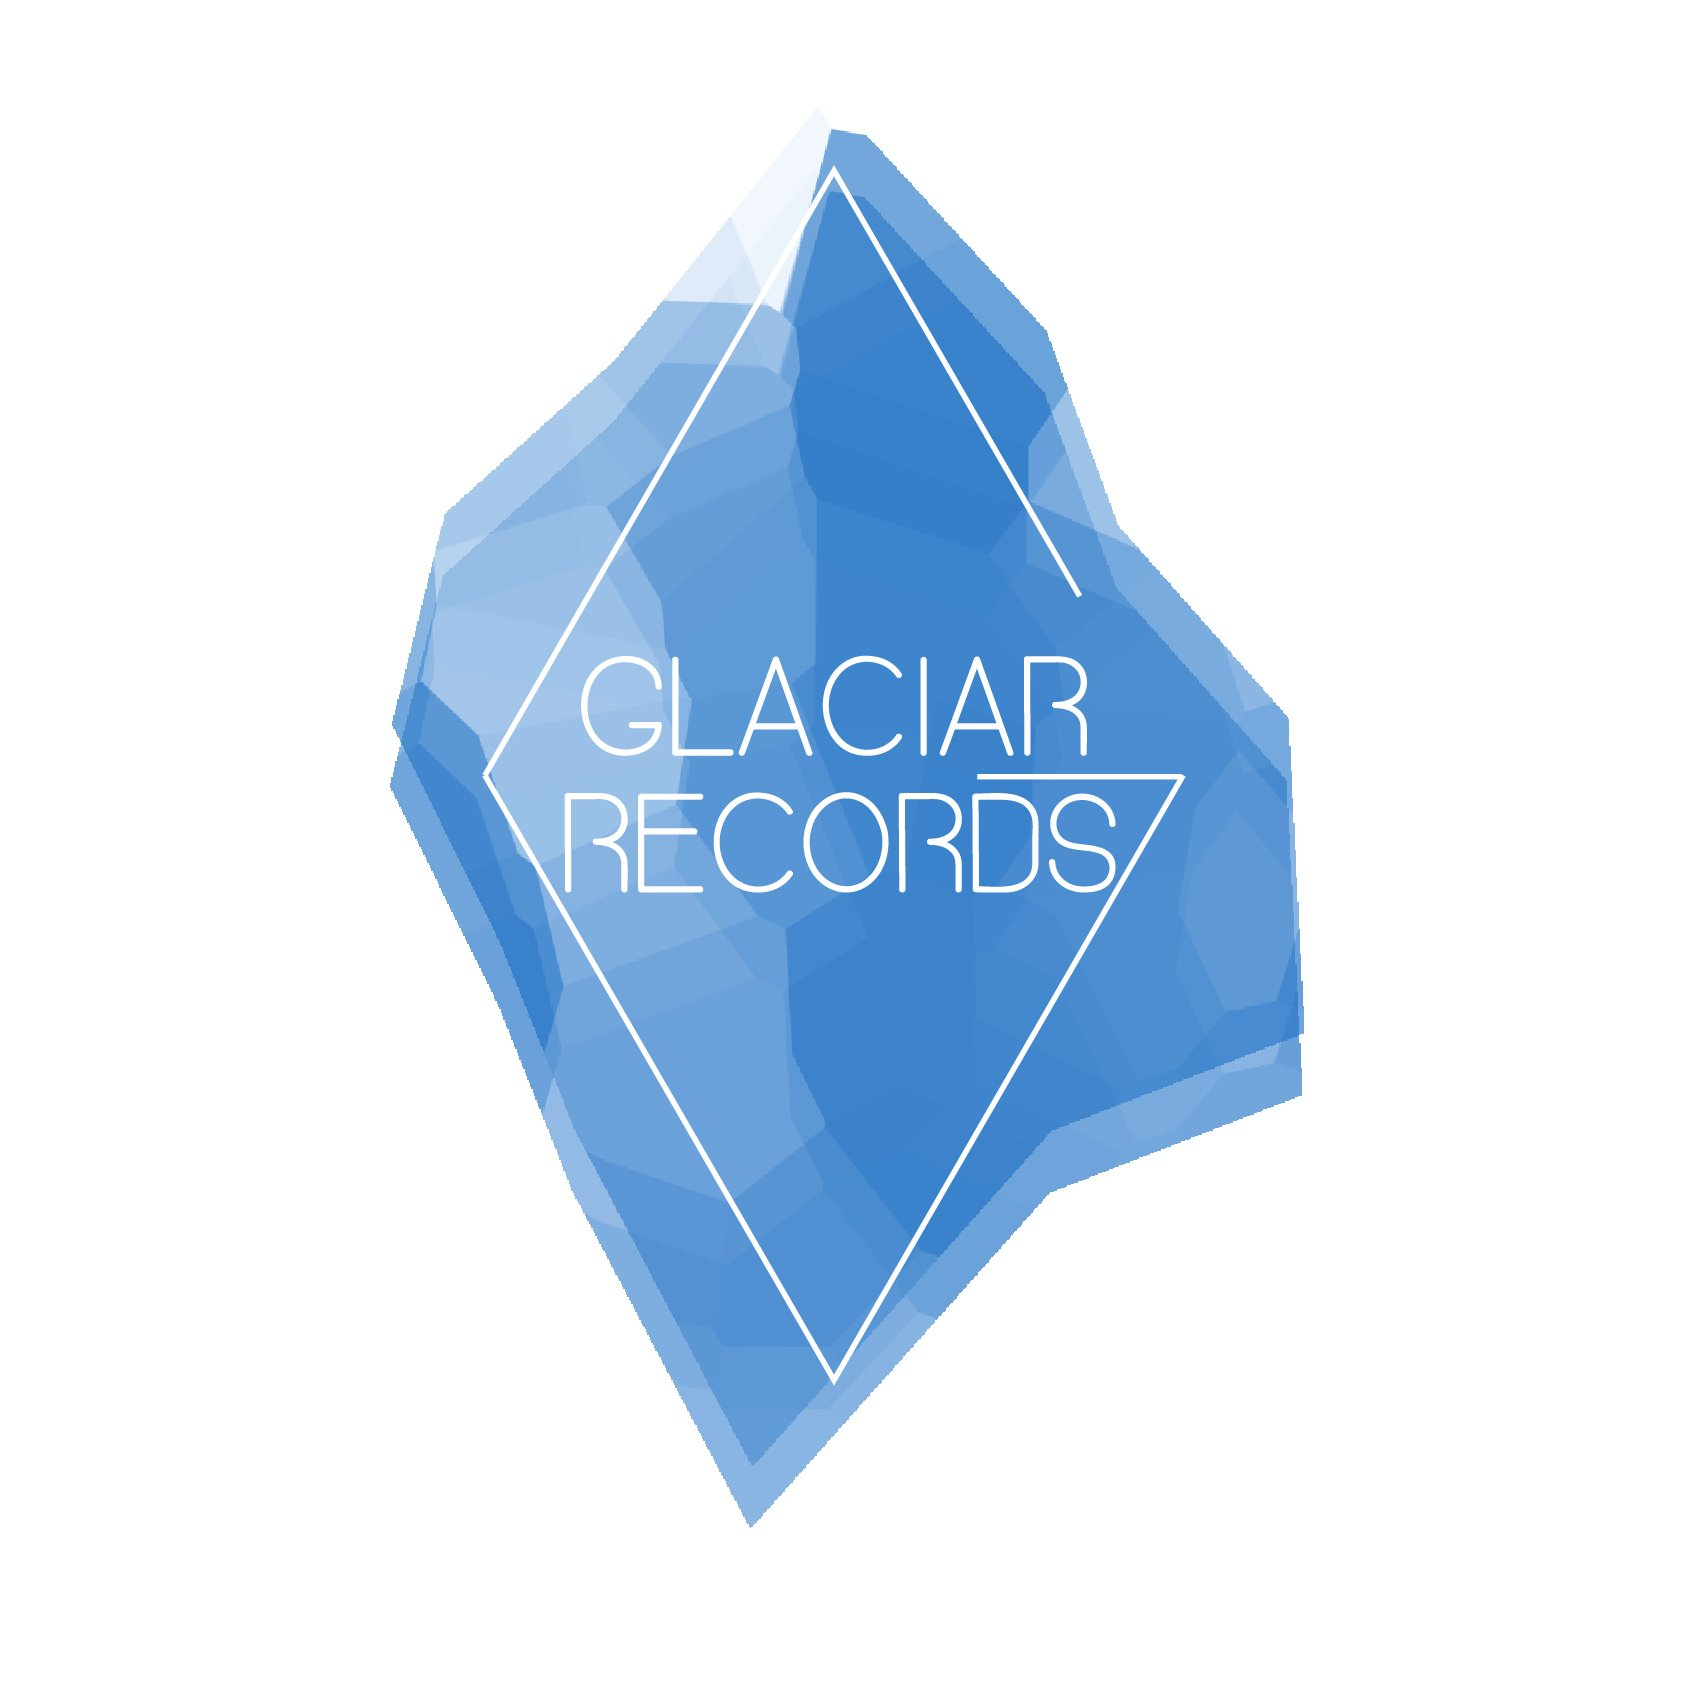 Glaciar Records